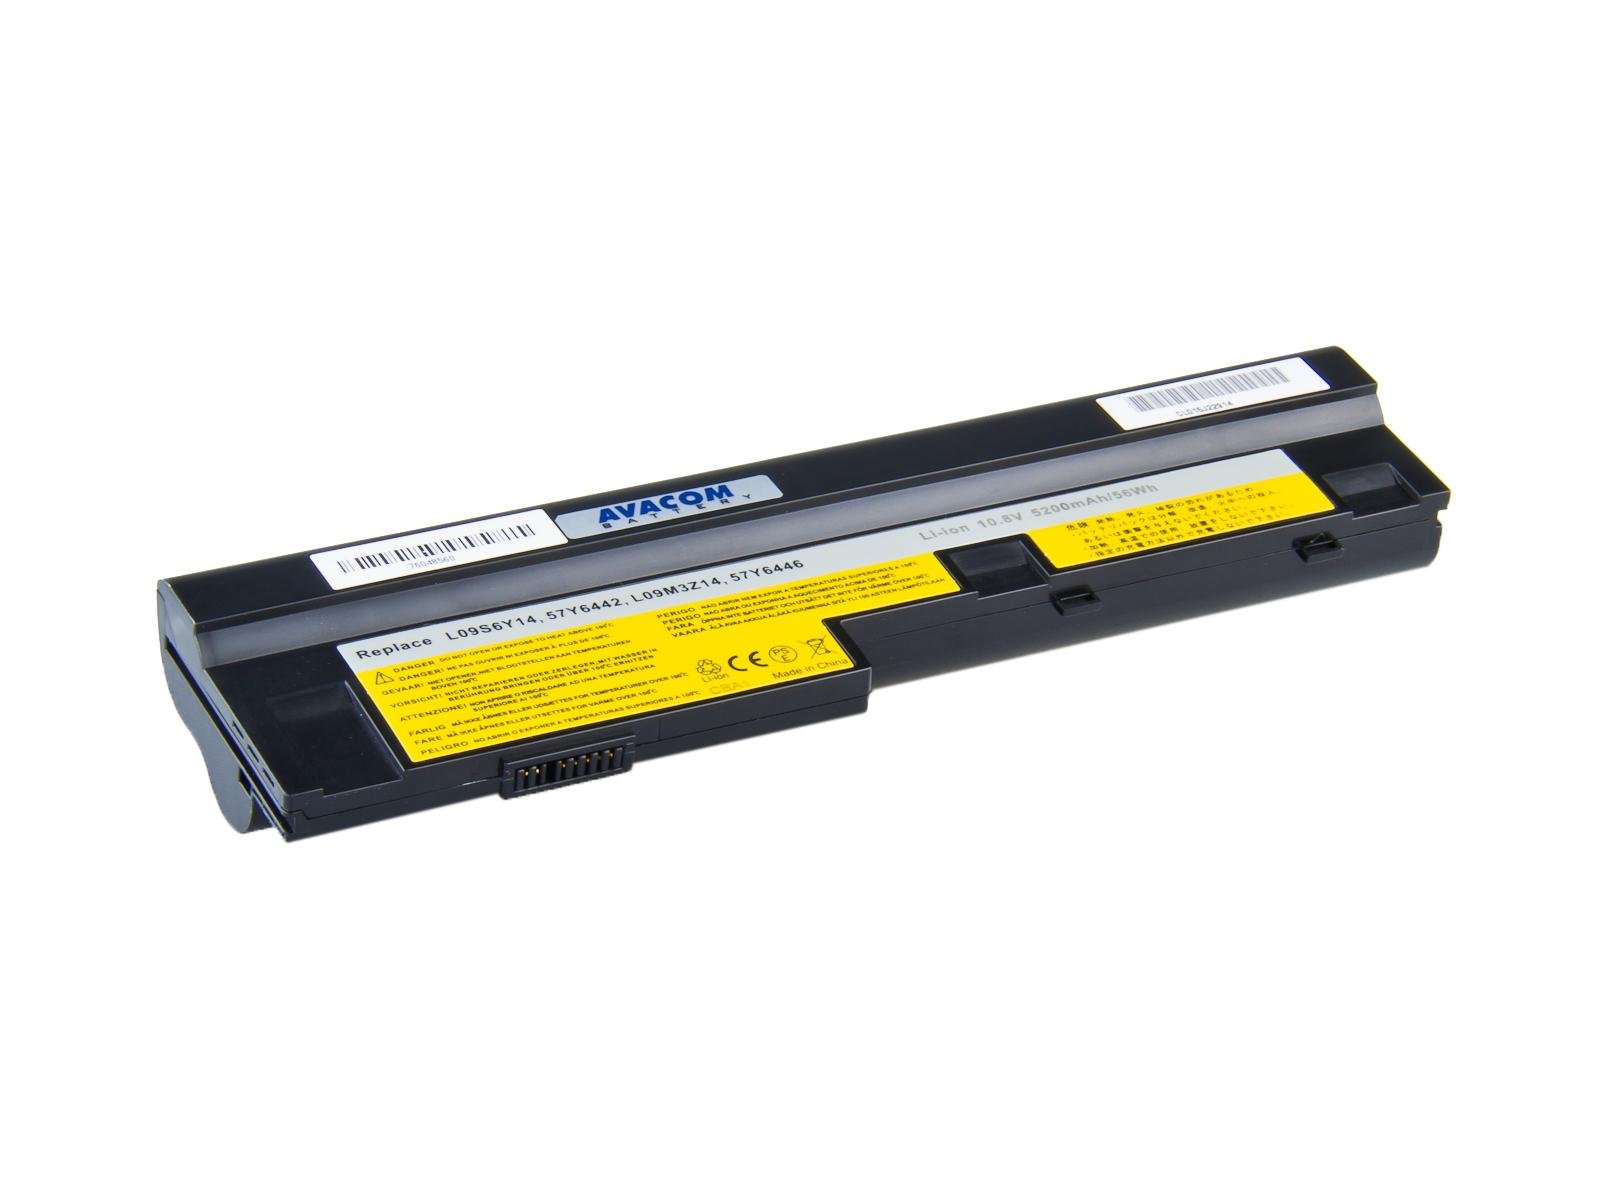 Baterie AVACOM NOLE-IS3BH-806 pro Lenovo IdeaPad S10-3, U165 Li-Ion 10,8V 5200mAh/56Wh black